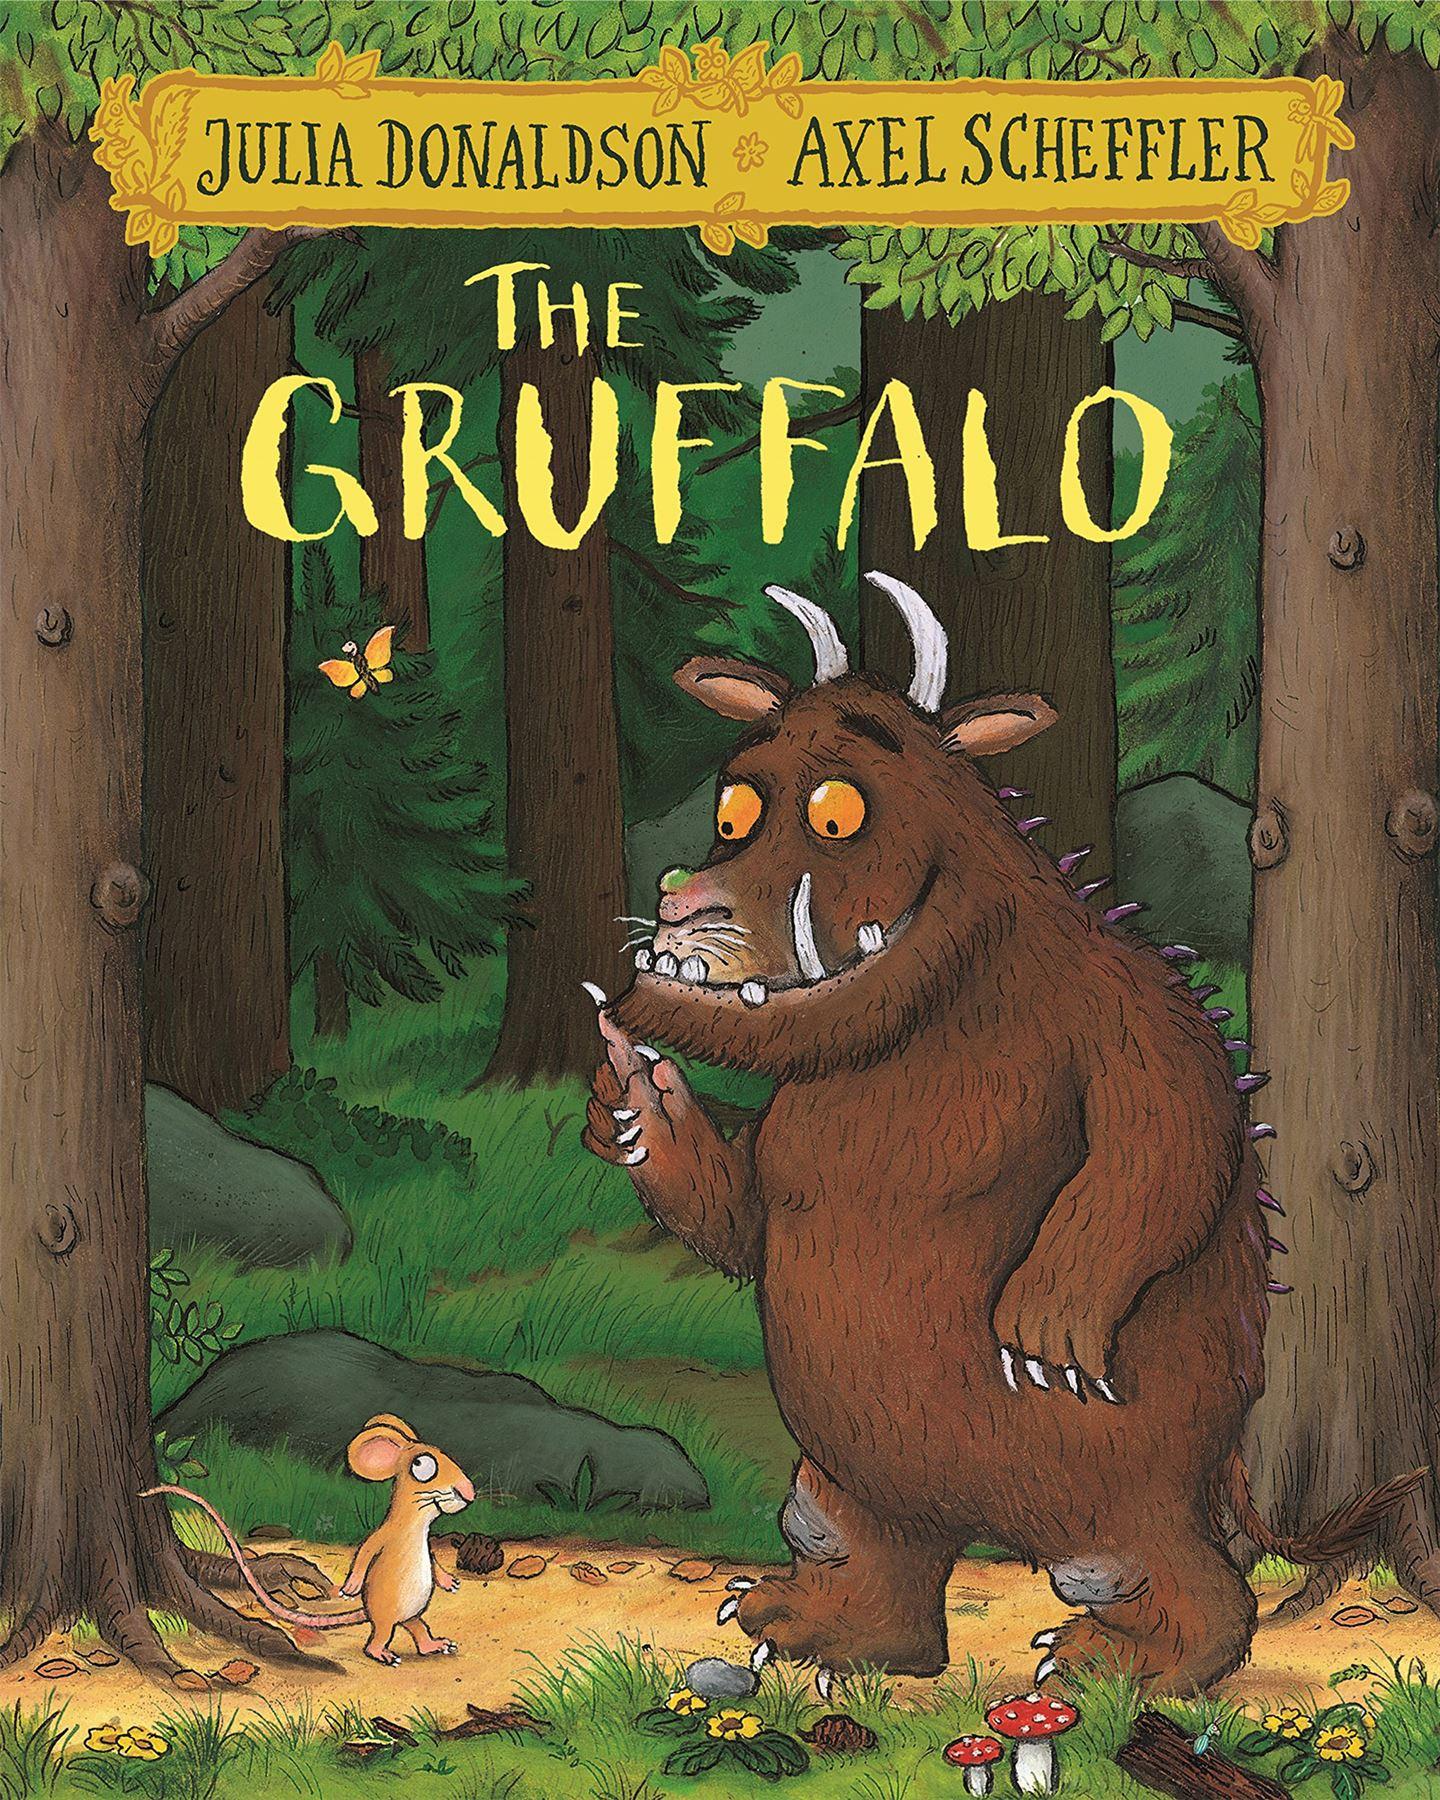 56d03ed5 0413 4999 a60f c9b854bdb4aa Antiques Expert Reveals Ten Common Children's Books That Could Make You Thousands